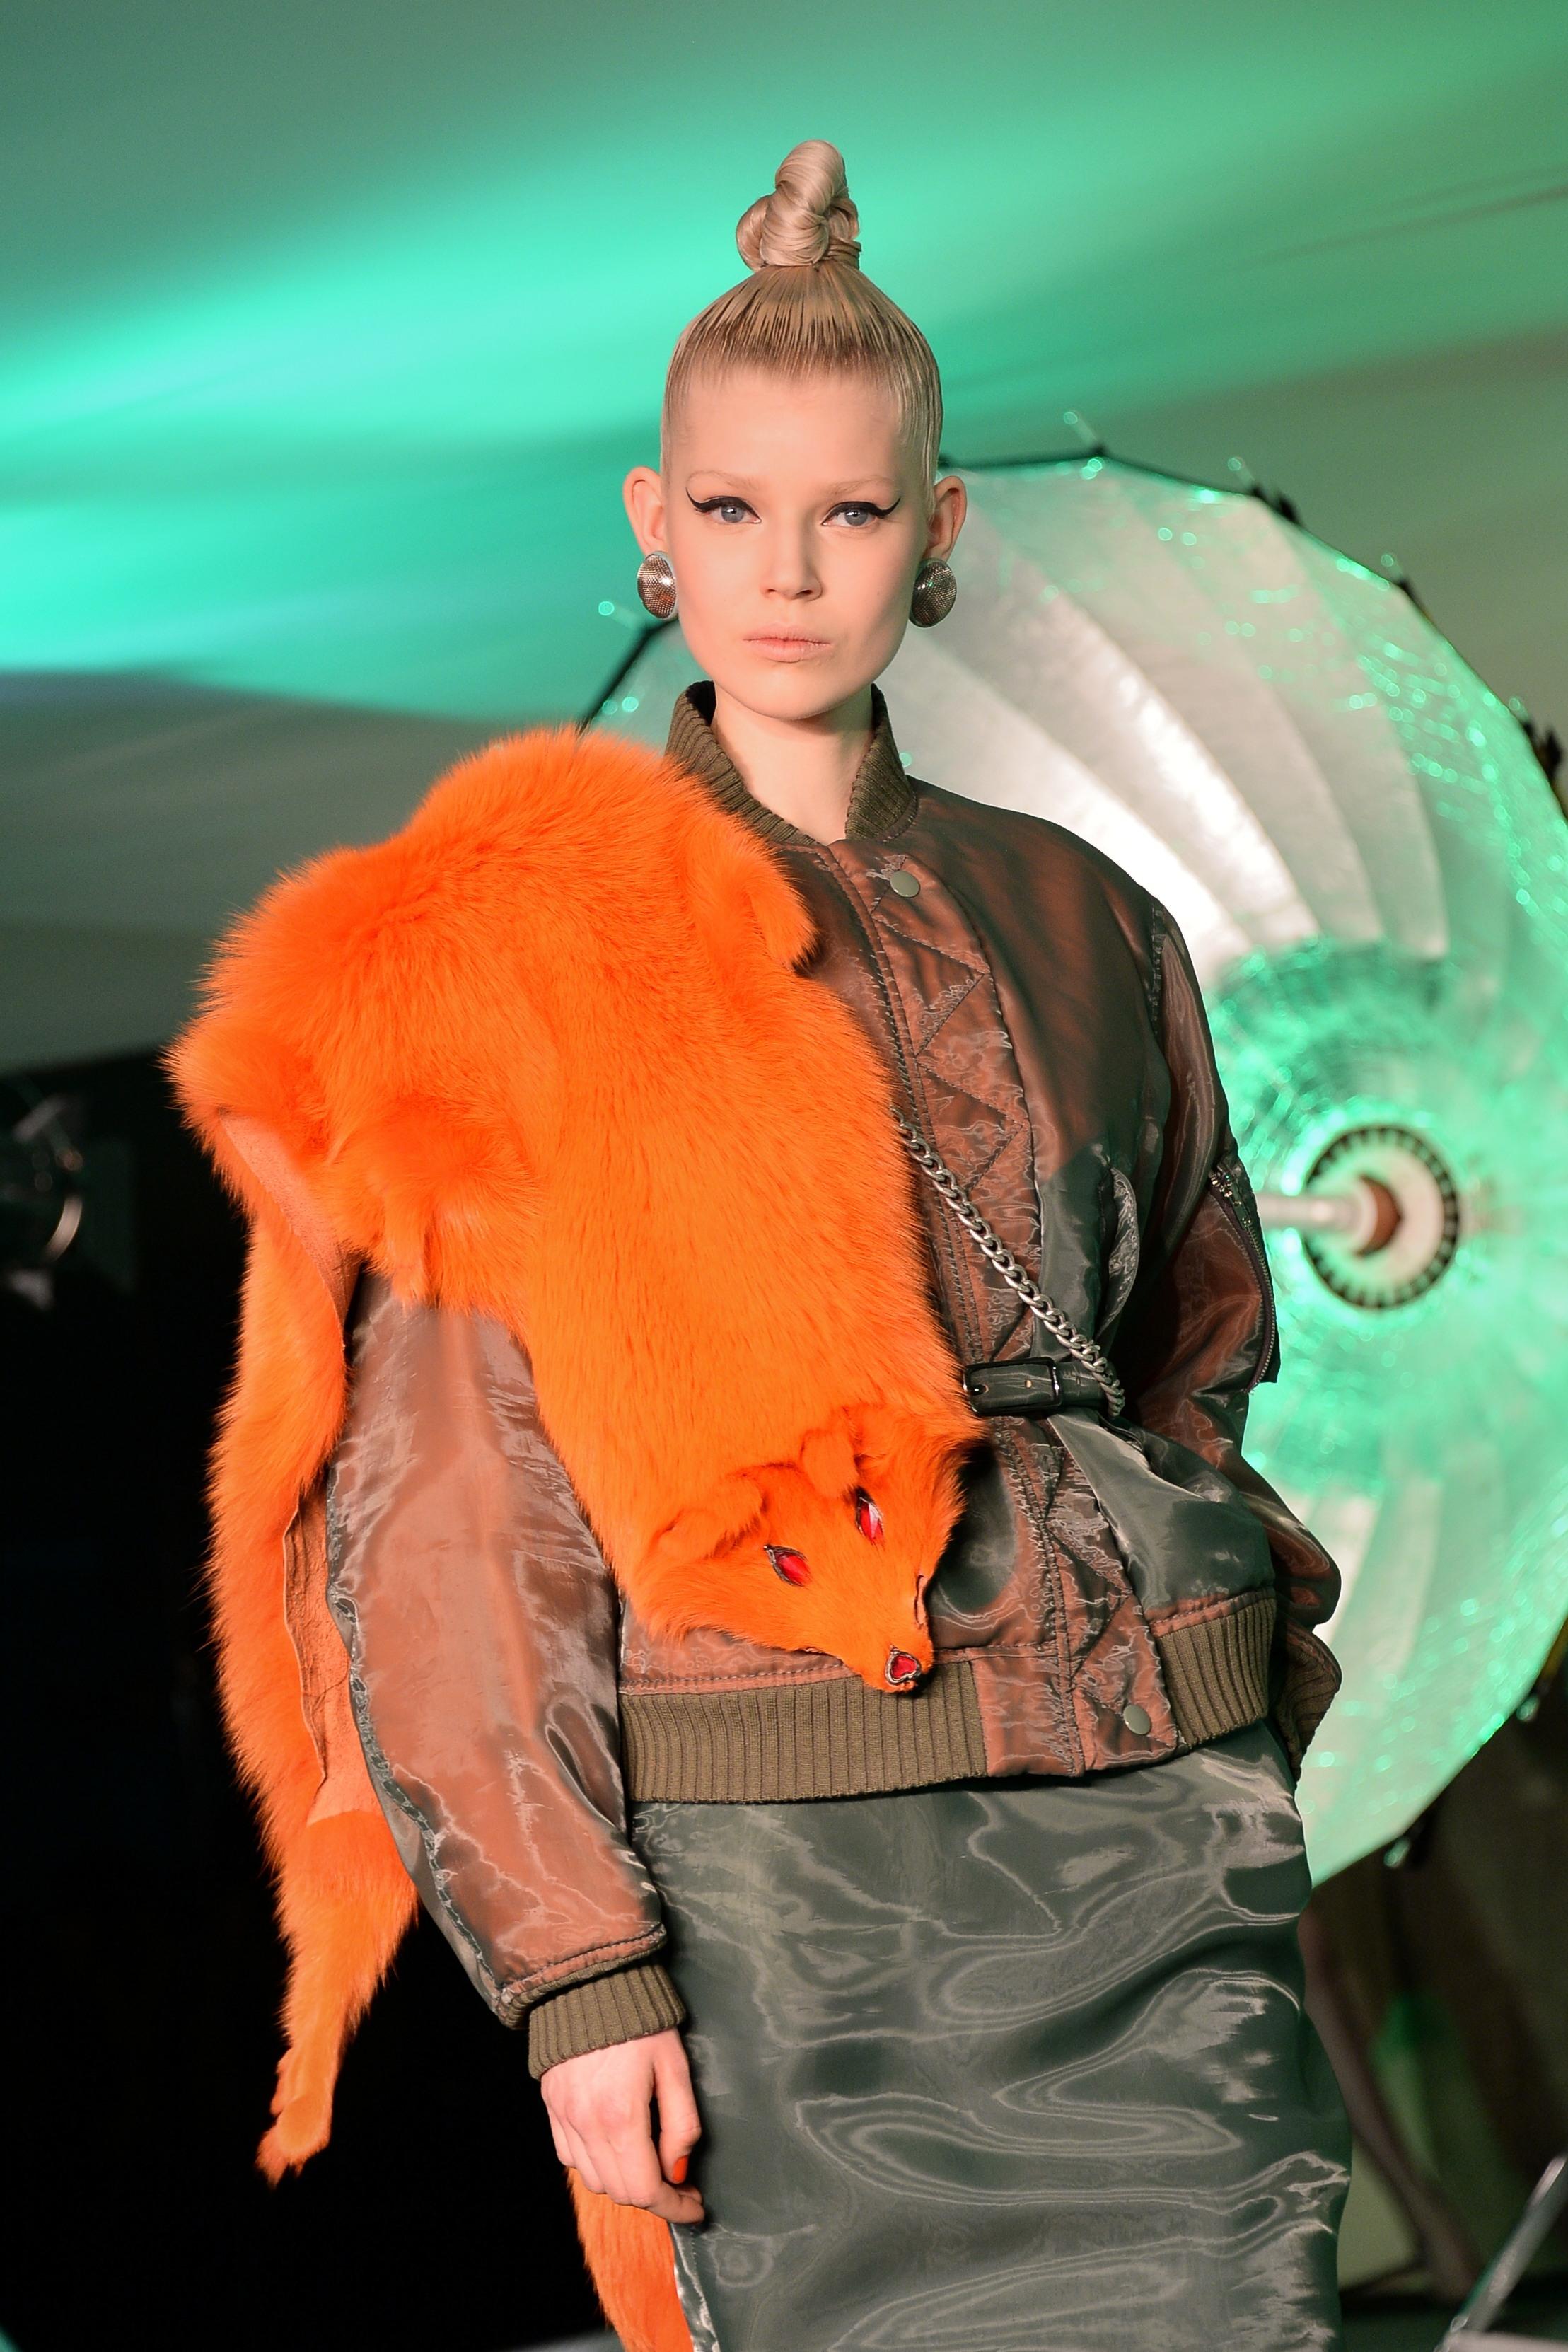 Paris Fashion Week - Jean-Paul Gaultier Runway